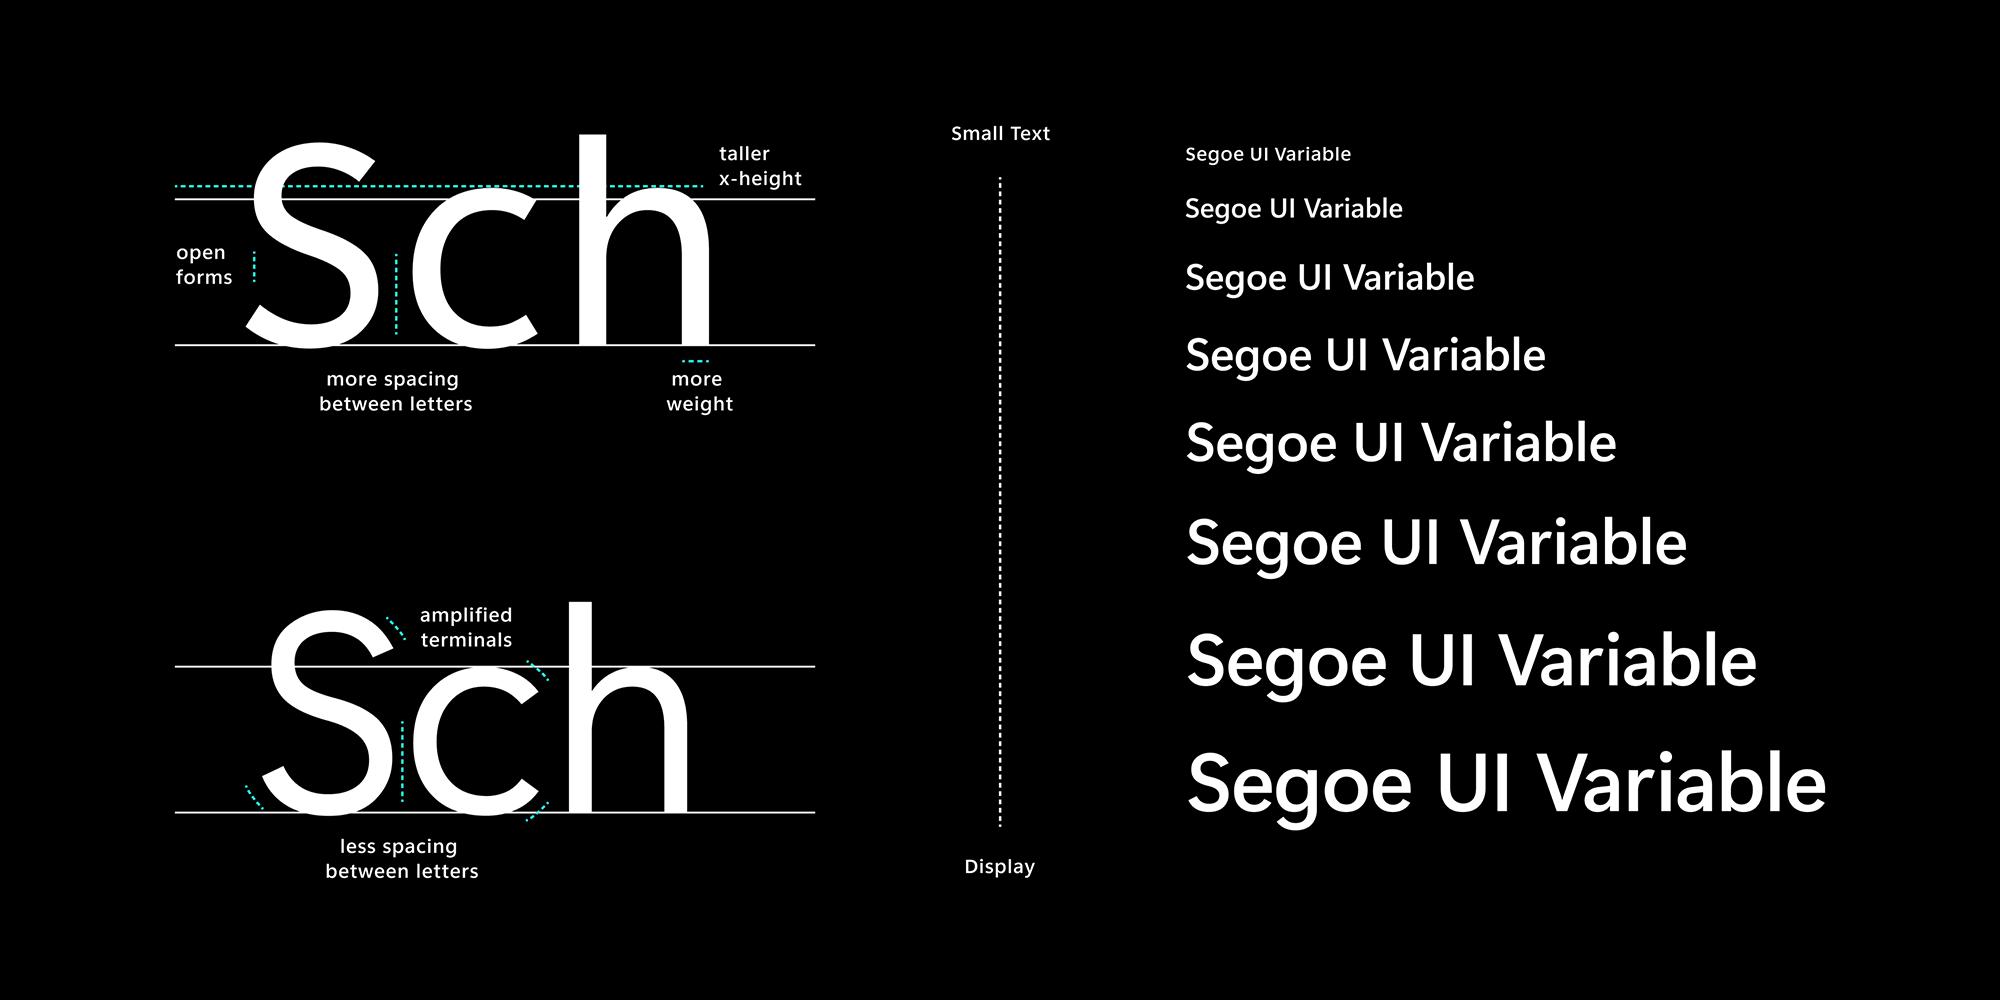 La nueva Segoe UI Variable de Windows 10